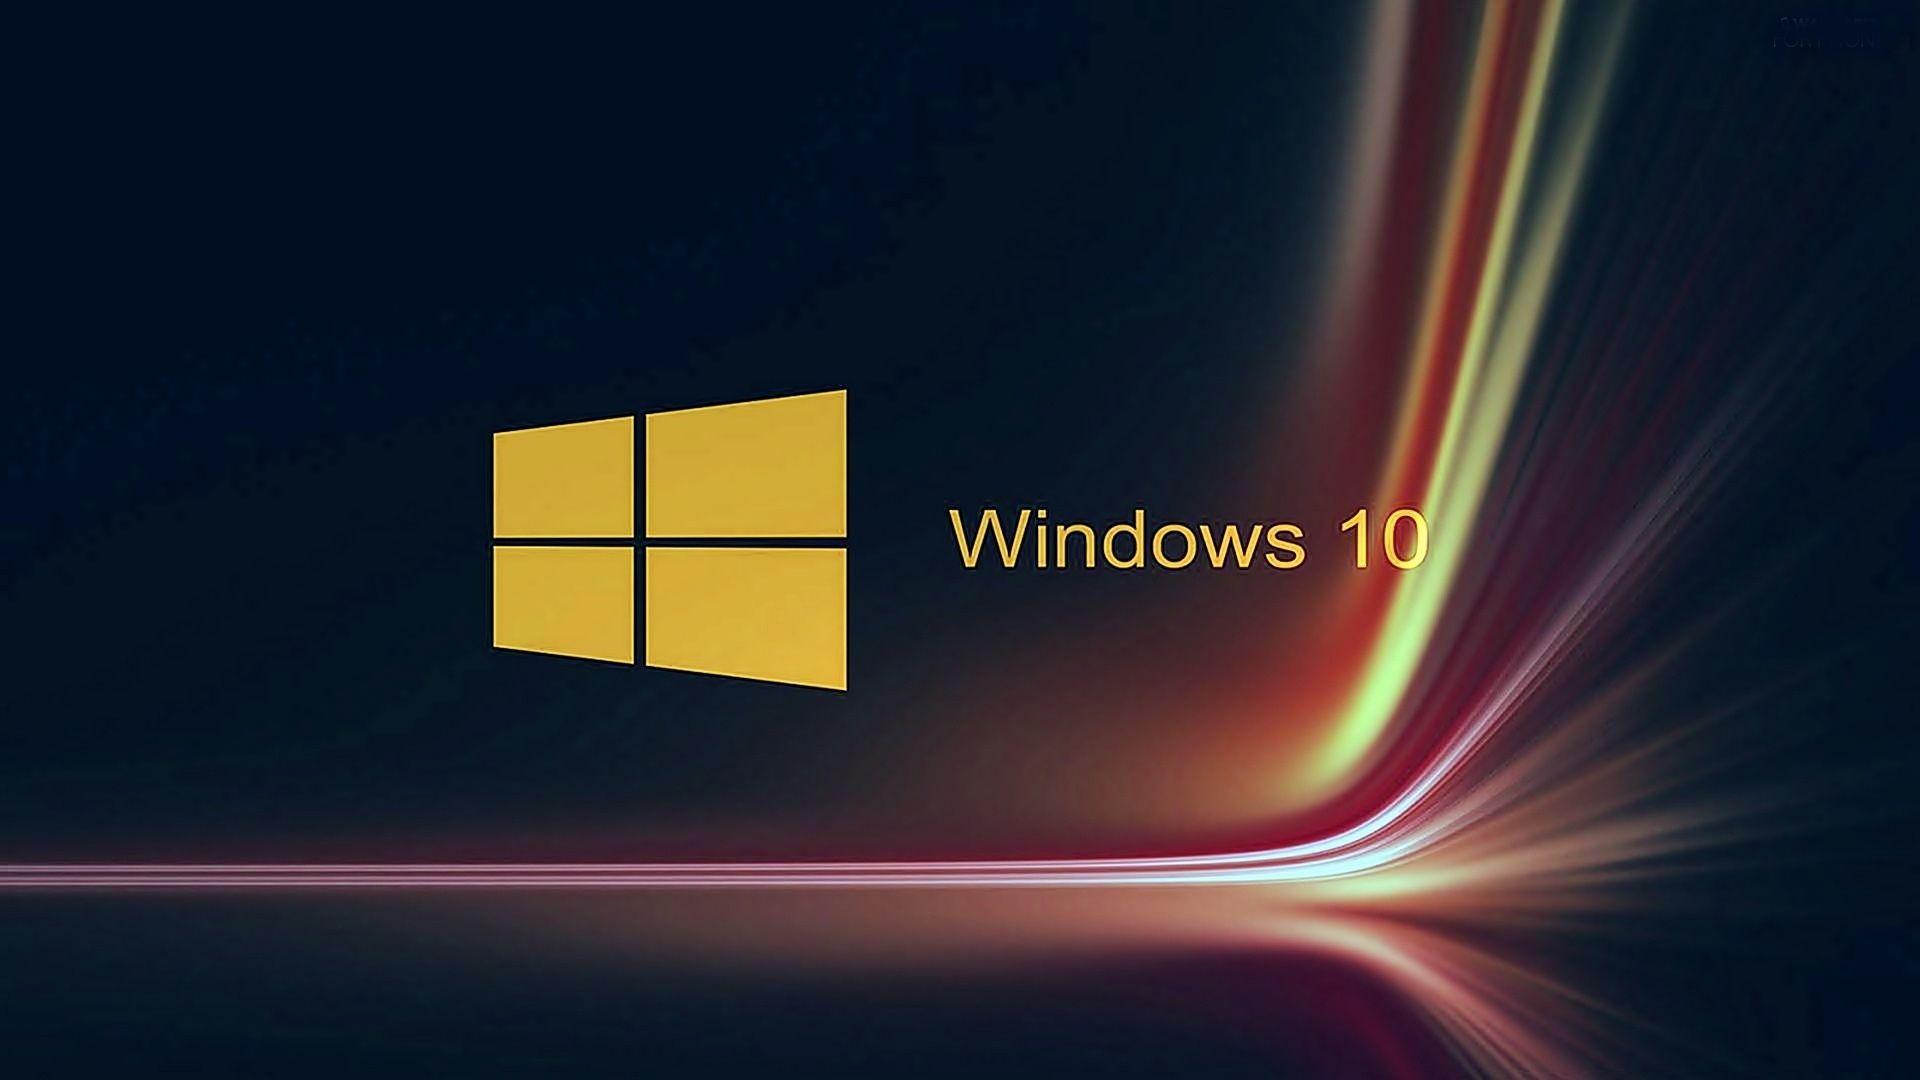 Pin By Ikbal Pranata On Hhhh Wallpaper Windows 10 Windows Wallpaper Computer Wallpaper Desktop Wallpapers